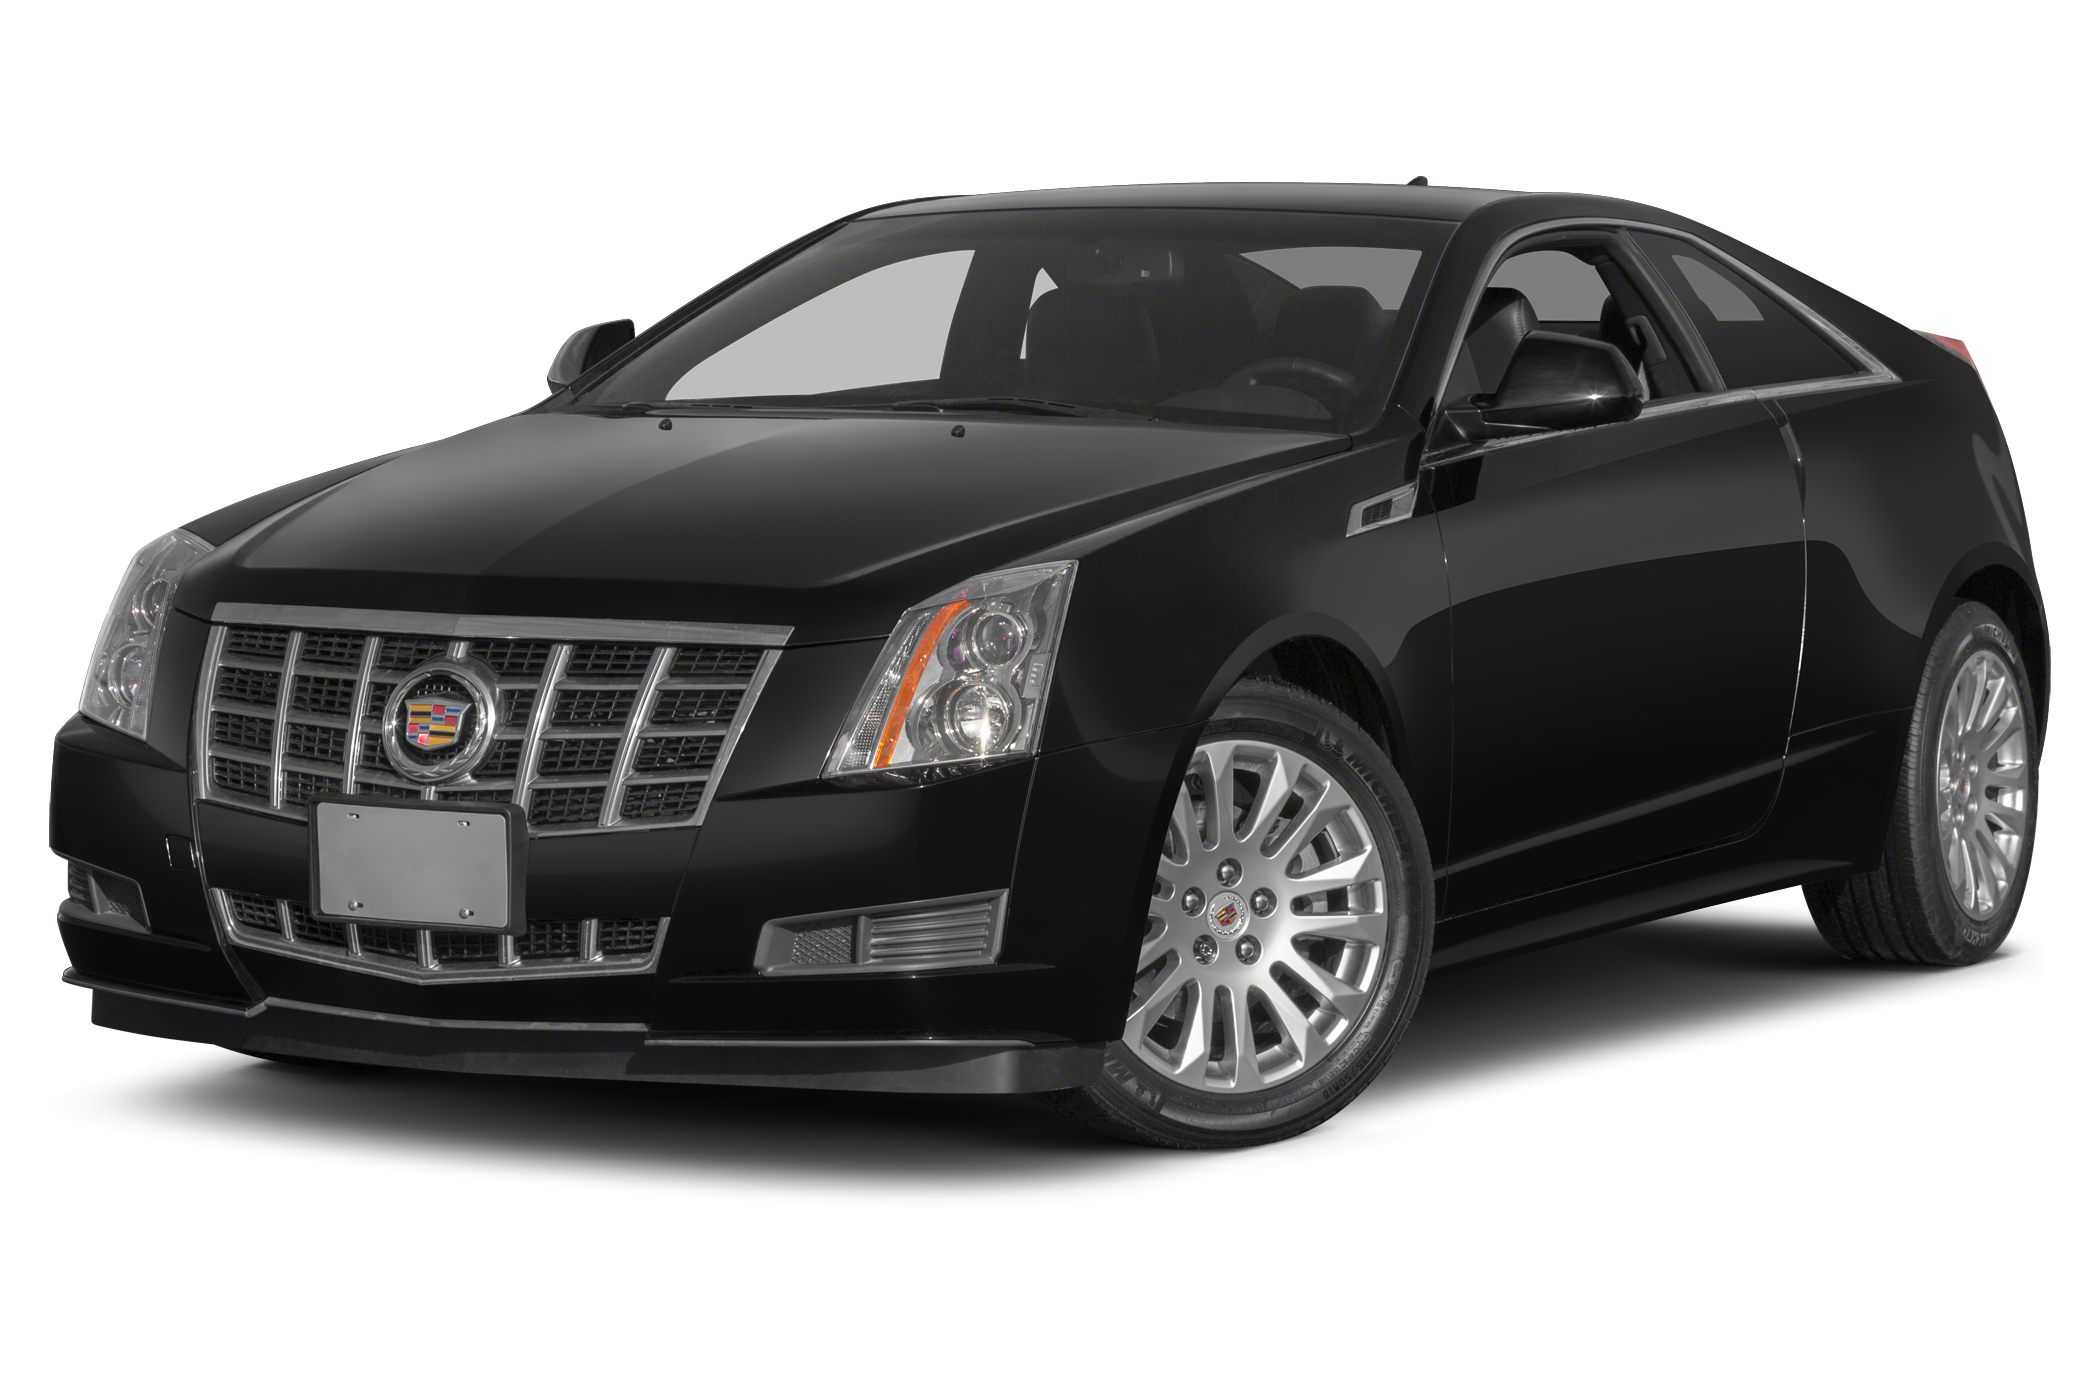 2014 Cadillac CTS  Miles 2032Stock 4692P VIN 1GLDA1E39E0154420